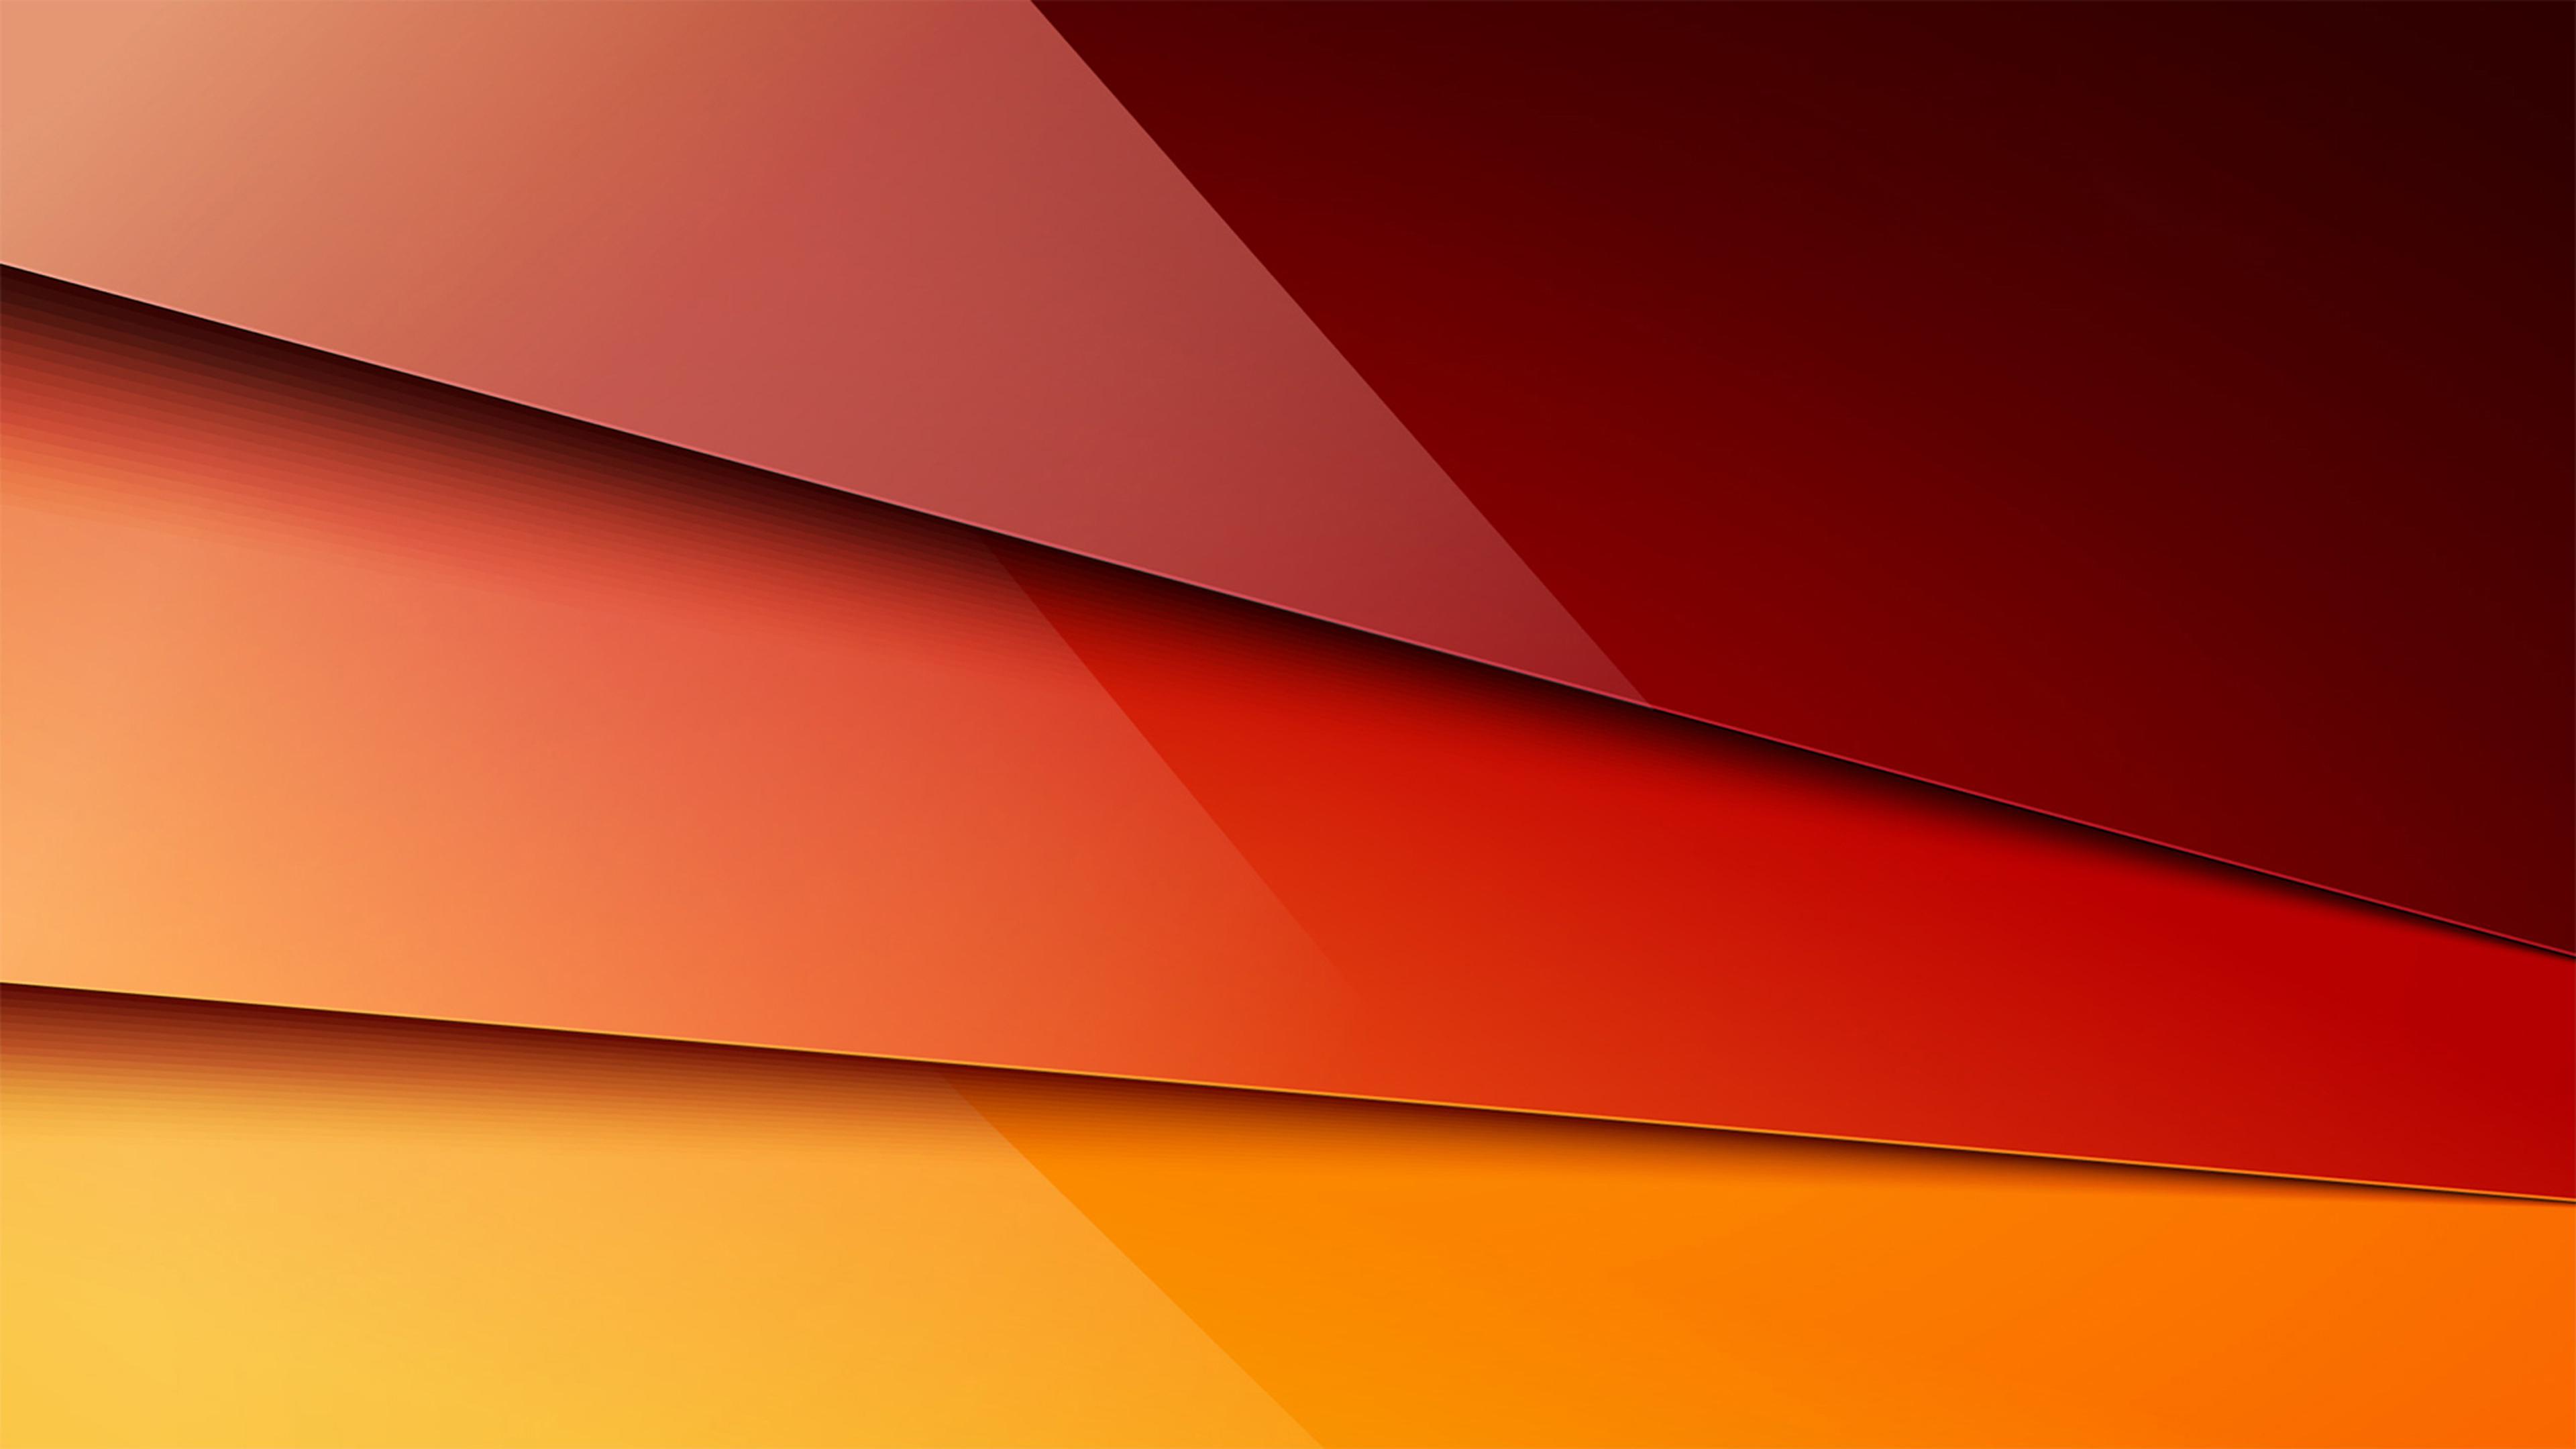 Orange Pattern 4K Wallpapers | HD Wallpapers